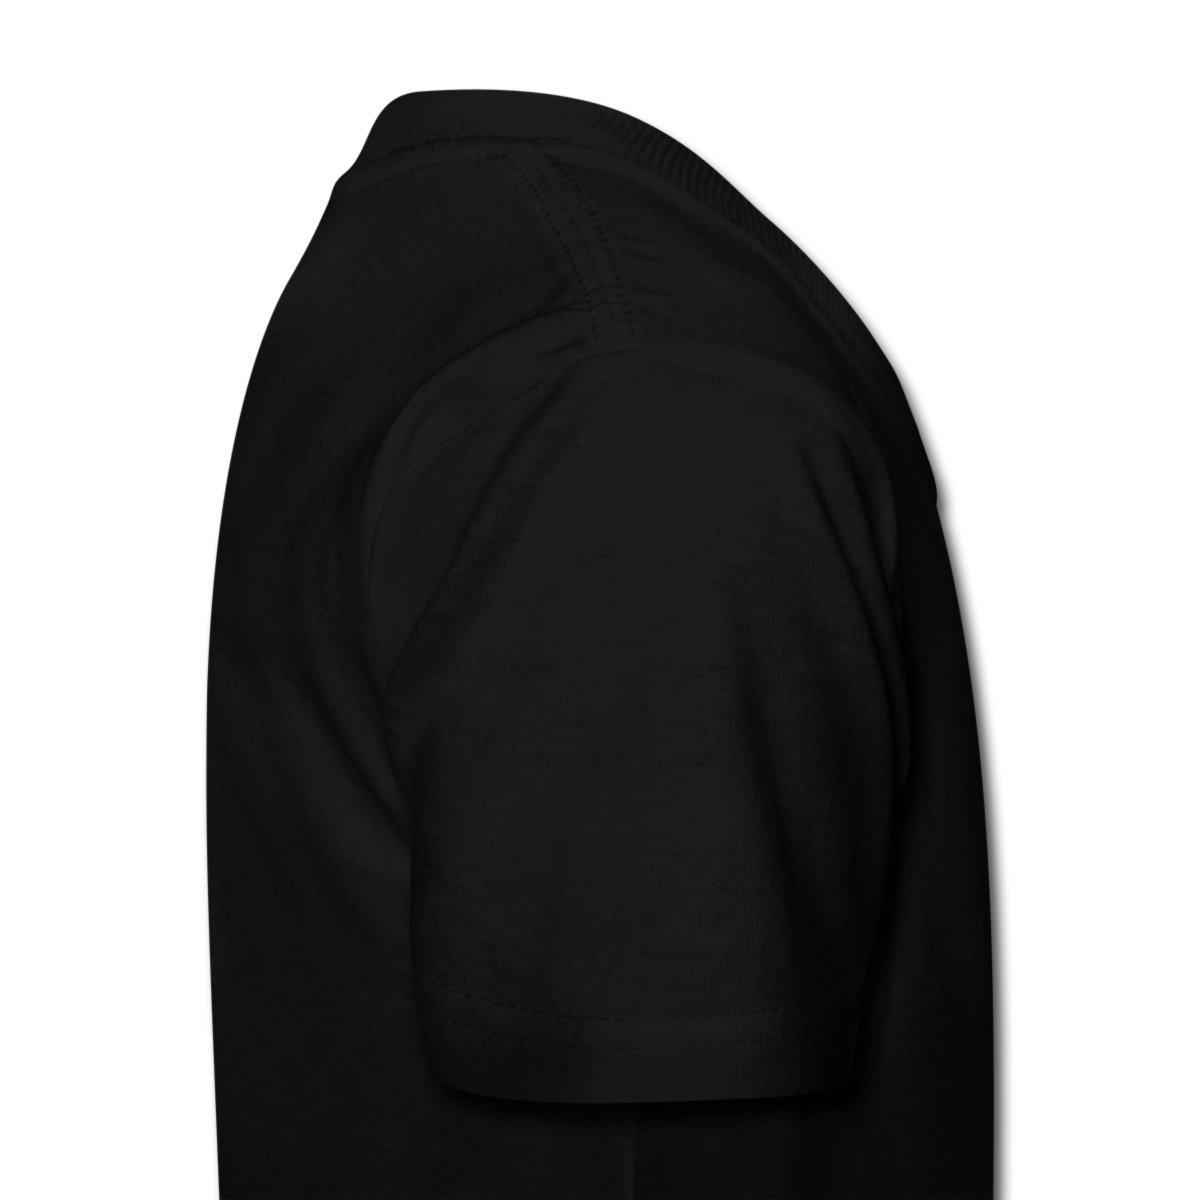 Song Mz. Hyde Halestorm Rock Band Short-Sleeve Crew Neck Comfort soft T-shirts For Men